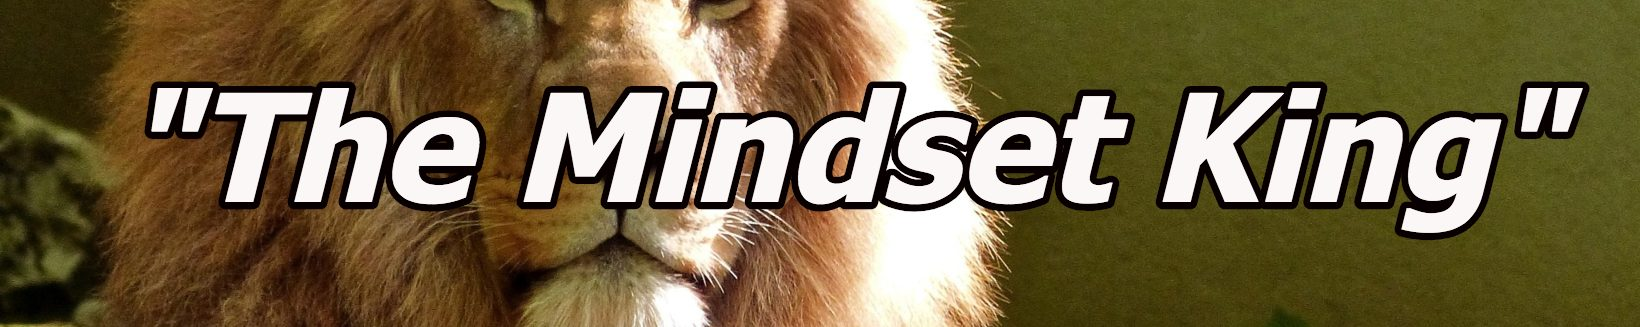 The Mindset King